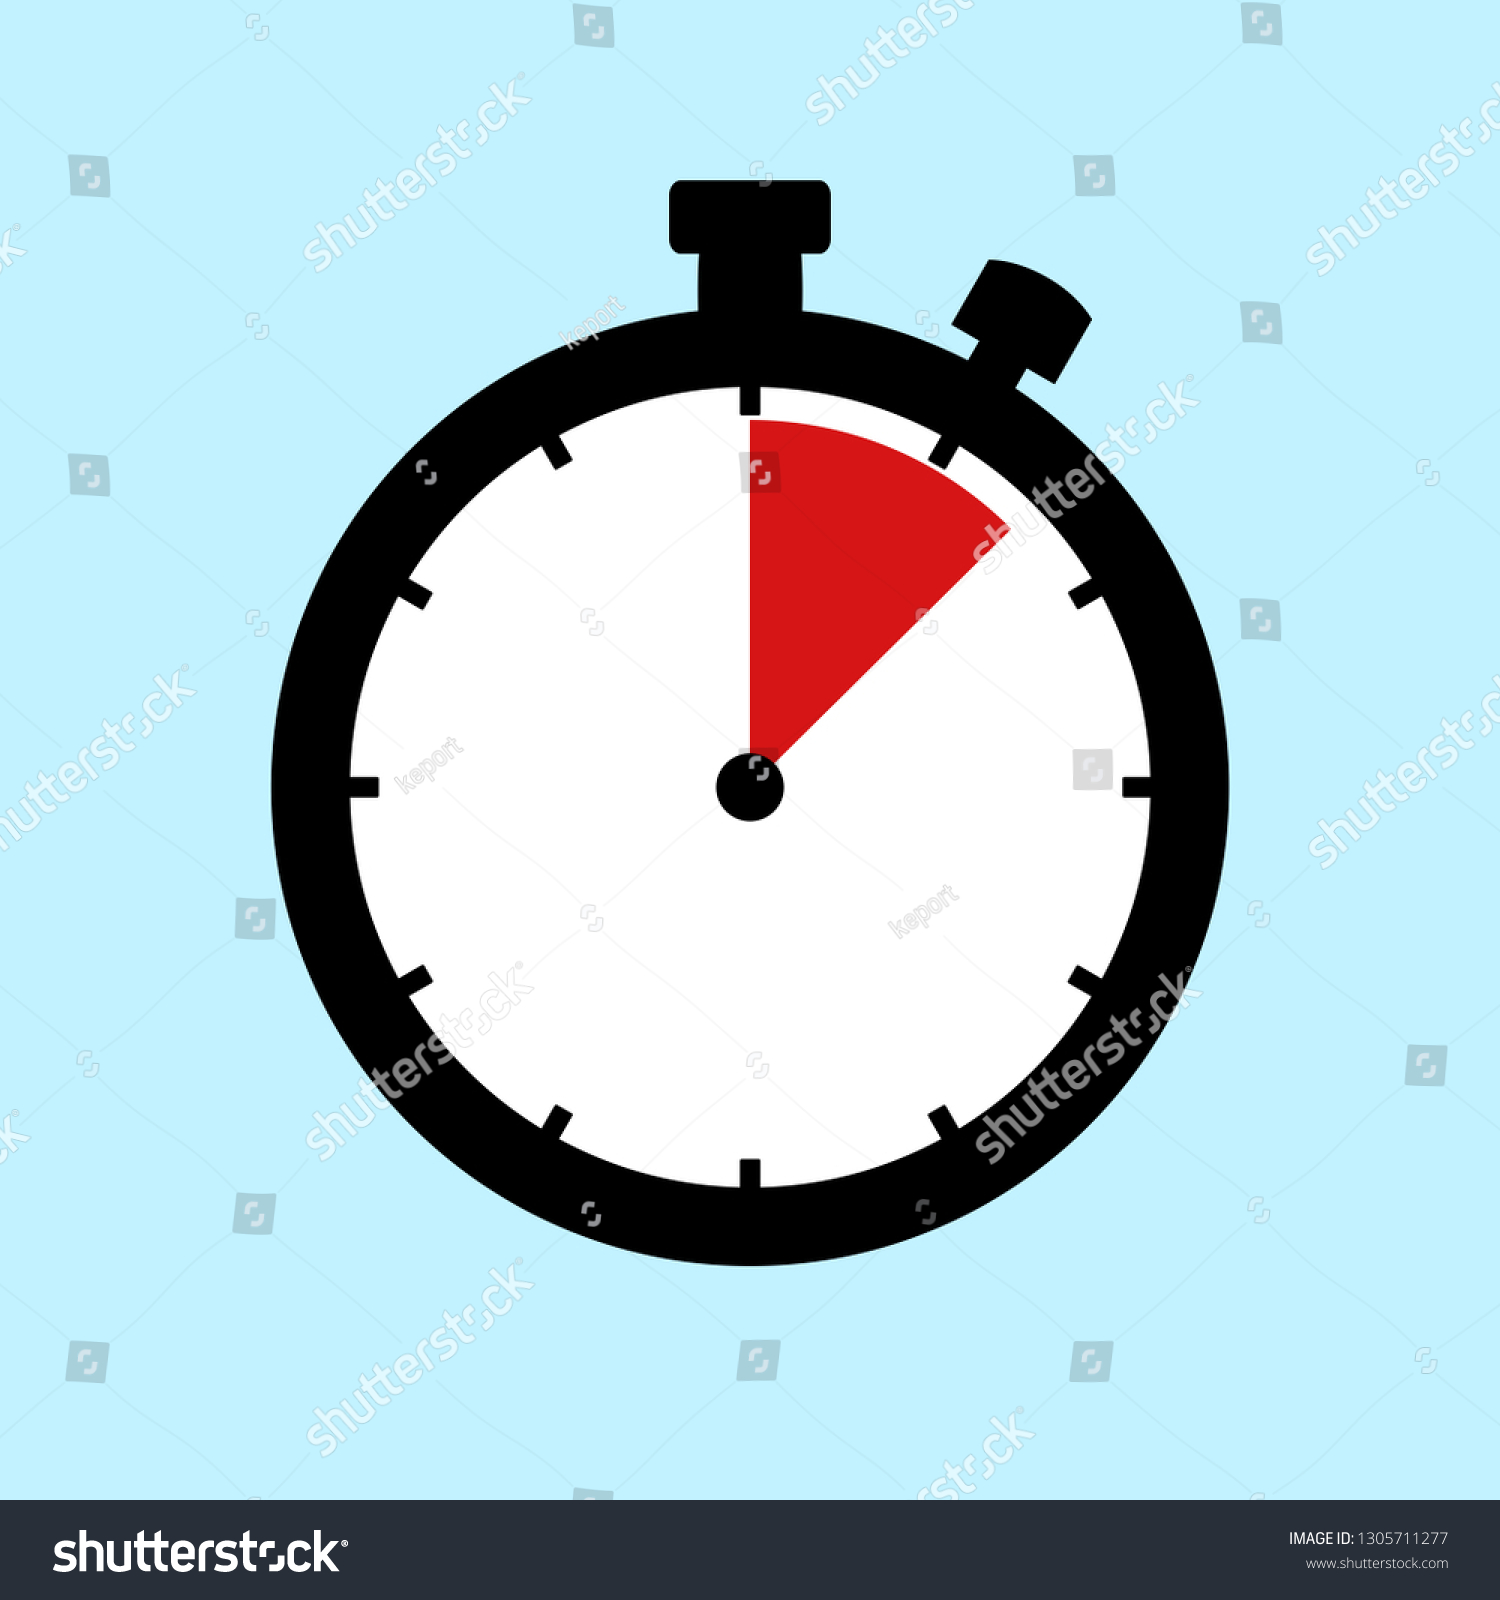 90 Minutes 15 Hours Flat Design Stock Illustration 1305711277